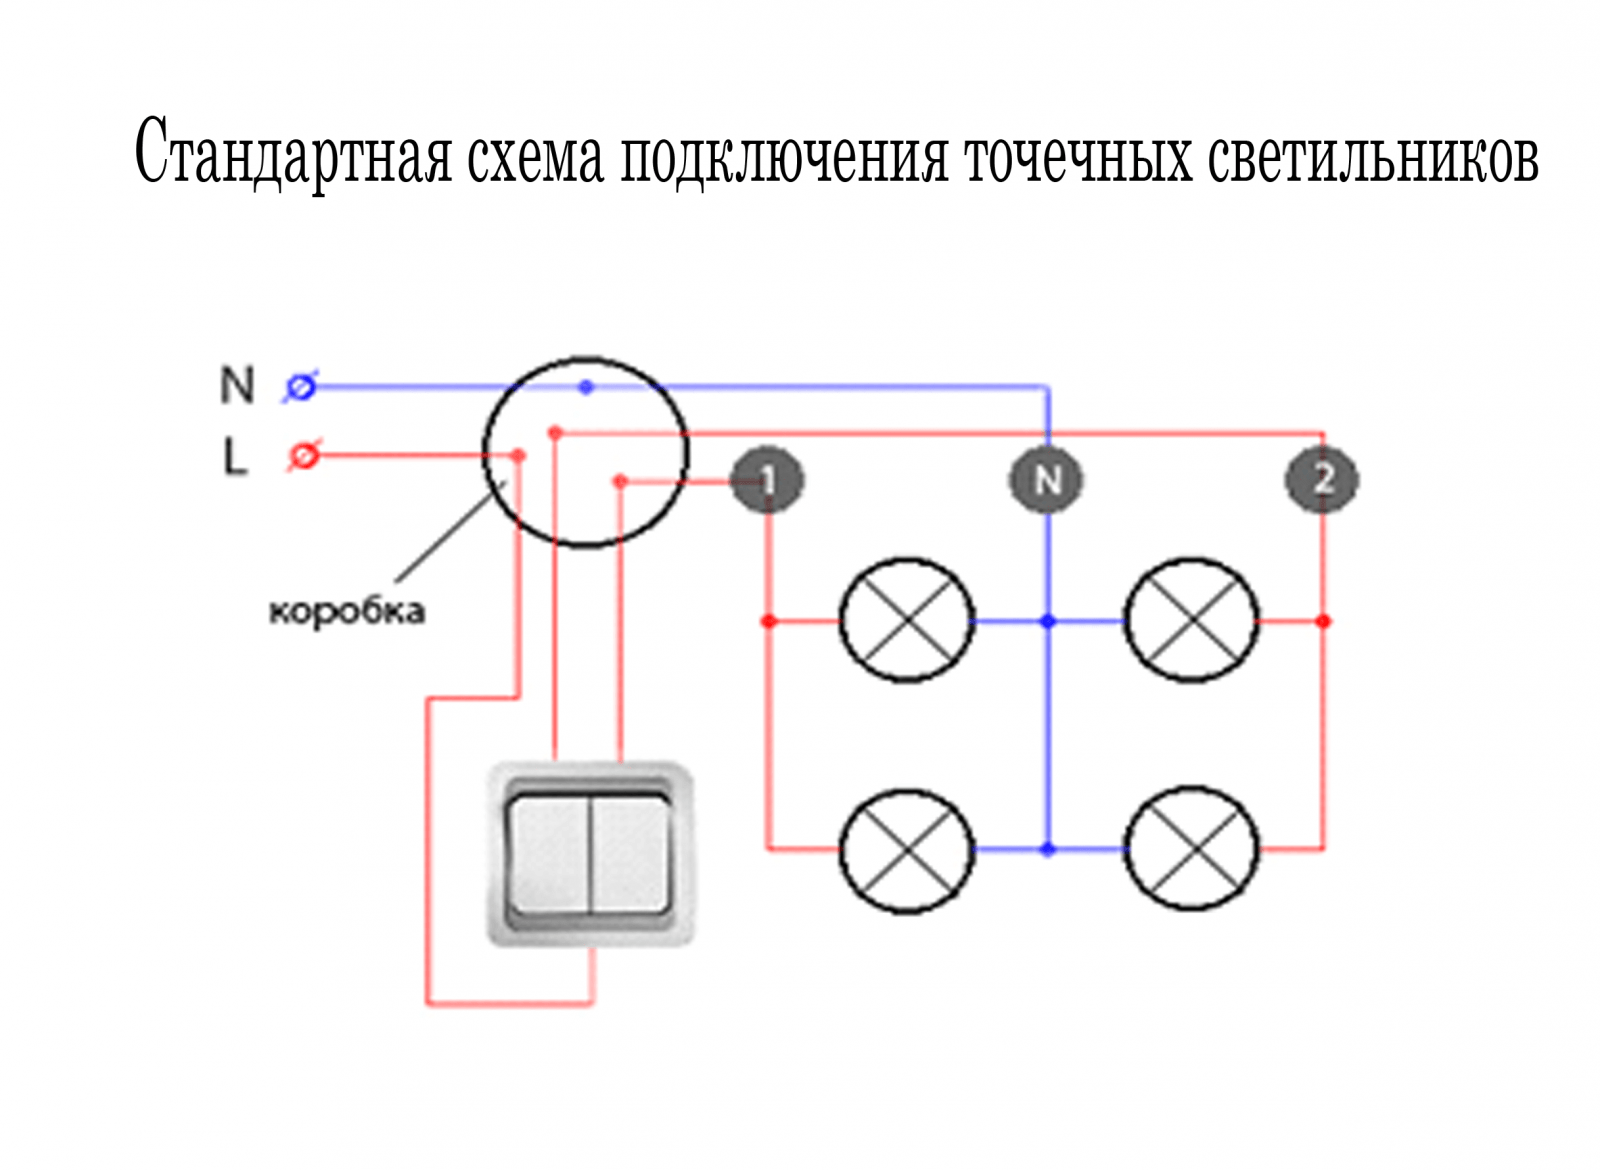 Стандартная схема